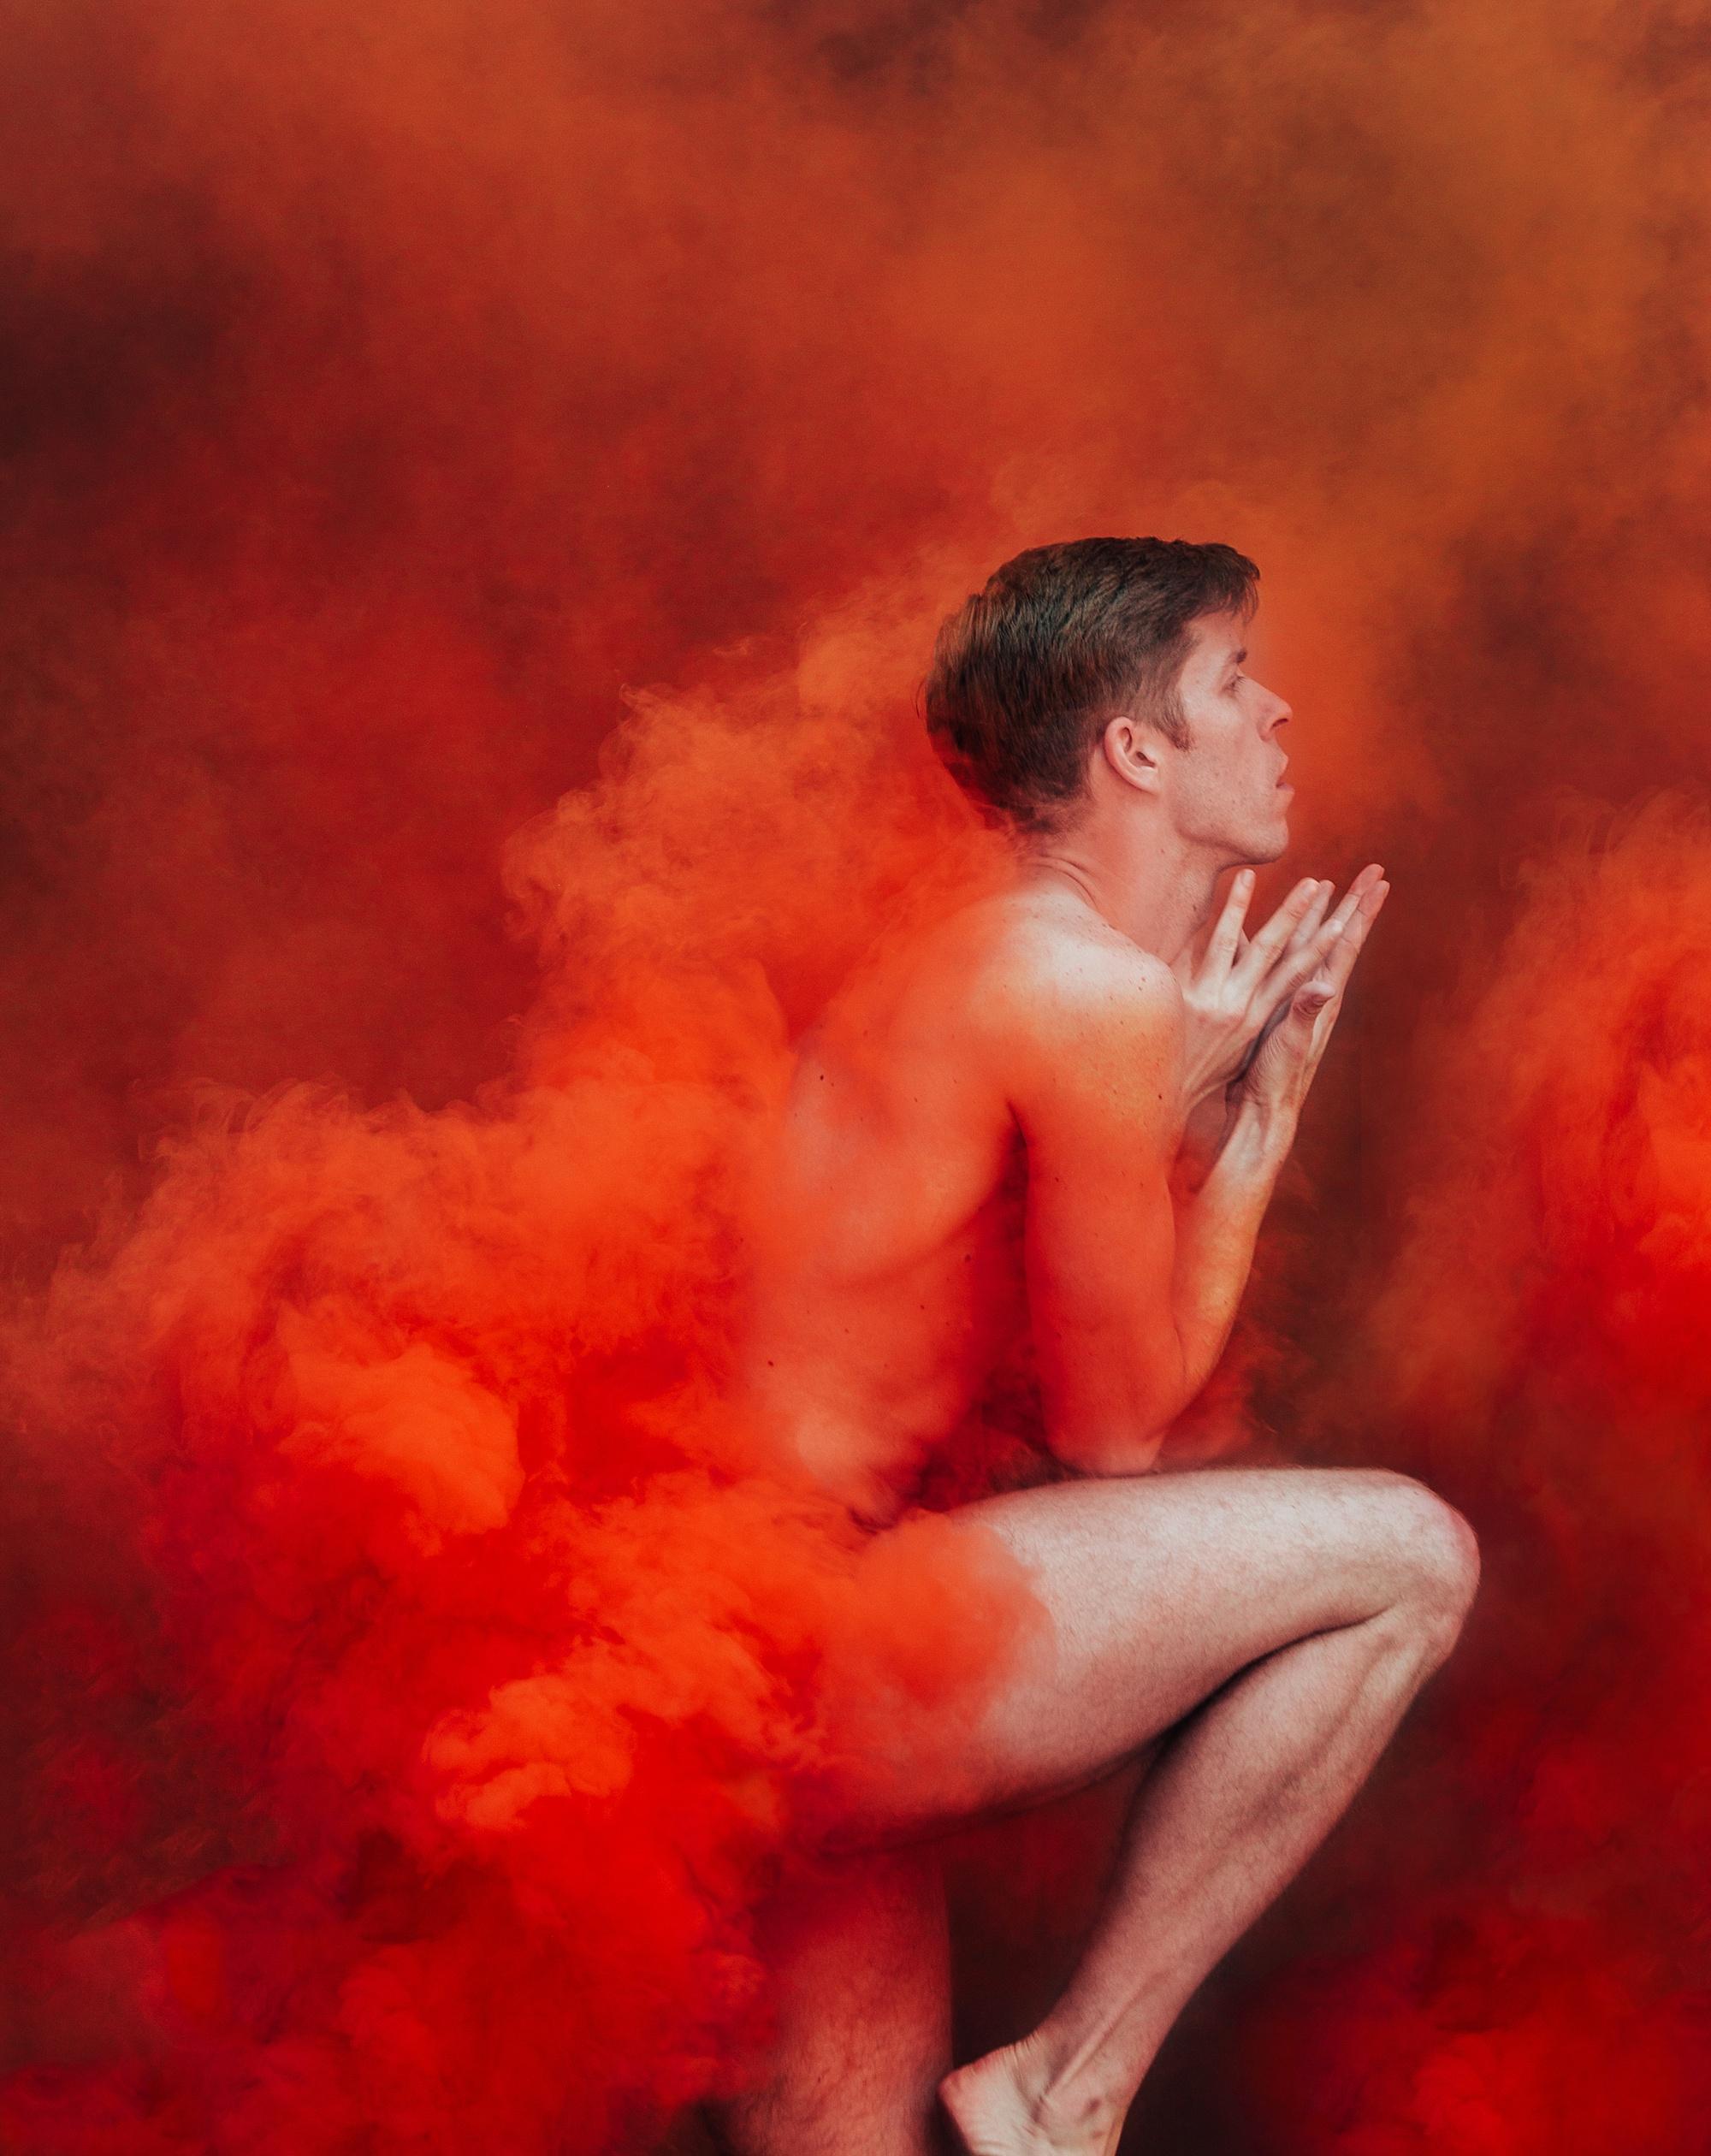 Joe_Mac_Creative_Nude_Portrait_Male_Philadelphia_Chad_Sapp__0044.jpg